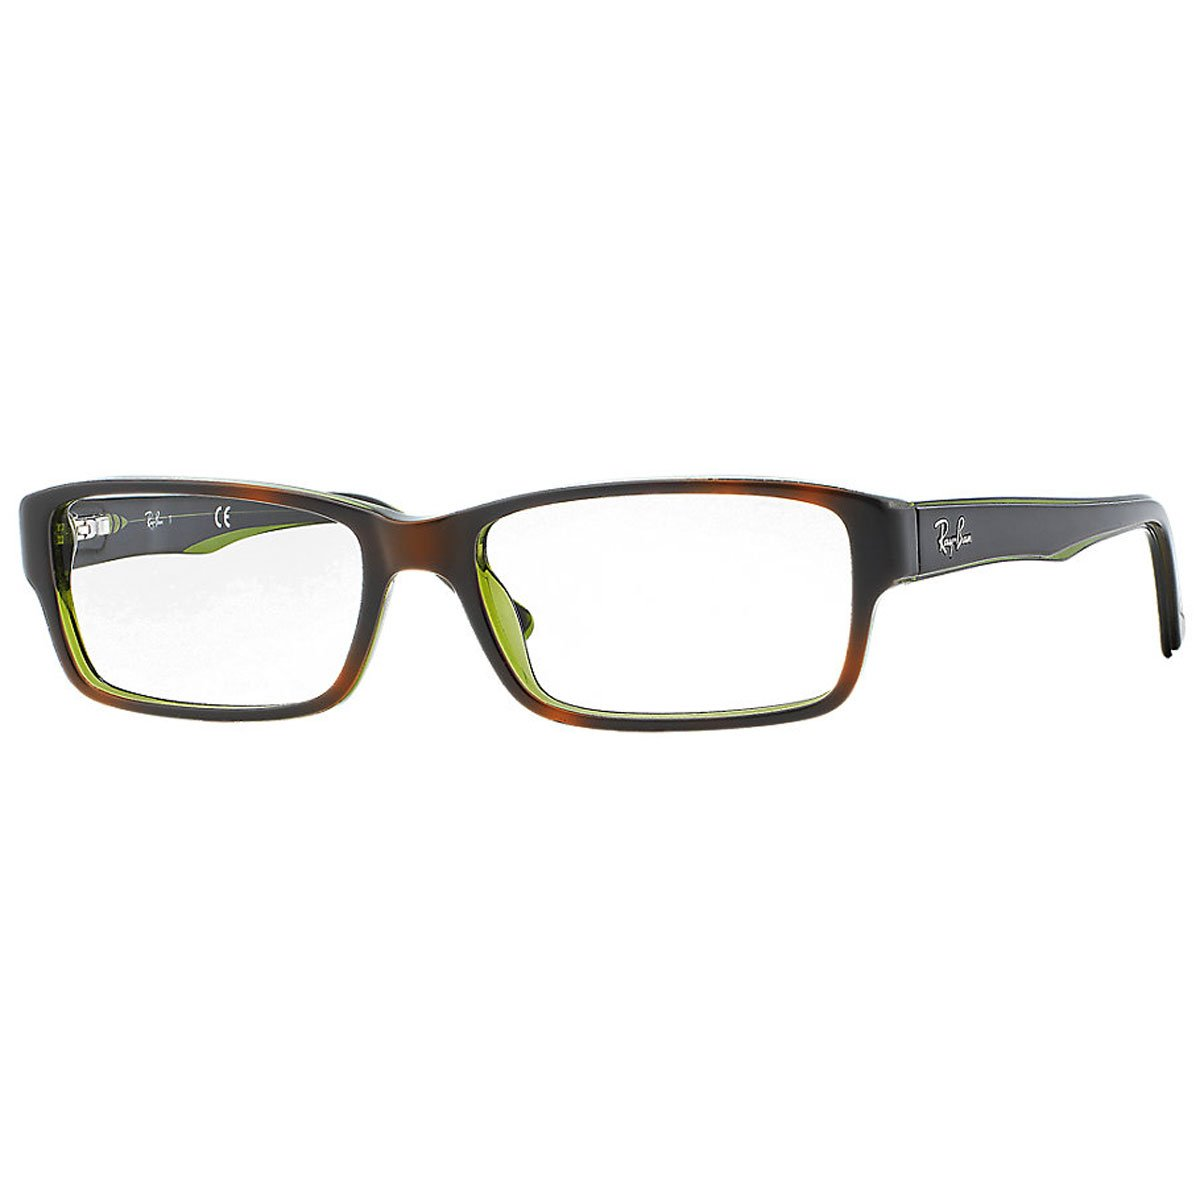 Ray-Ban RX5169 Eyeglasses Top Havana on Green Trans 52mm [Apparel] by Ray-Ban